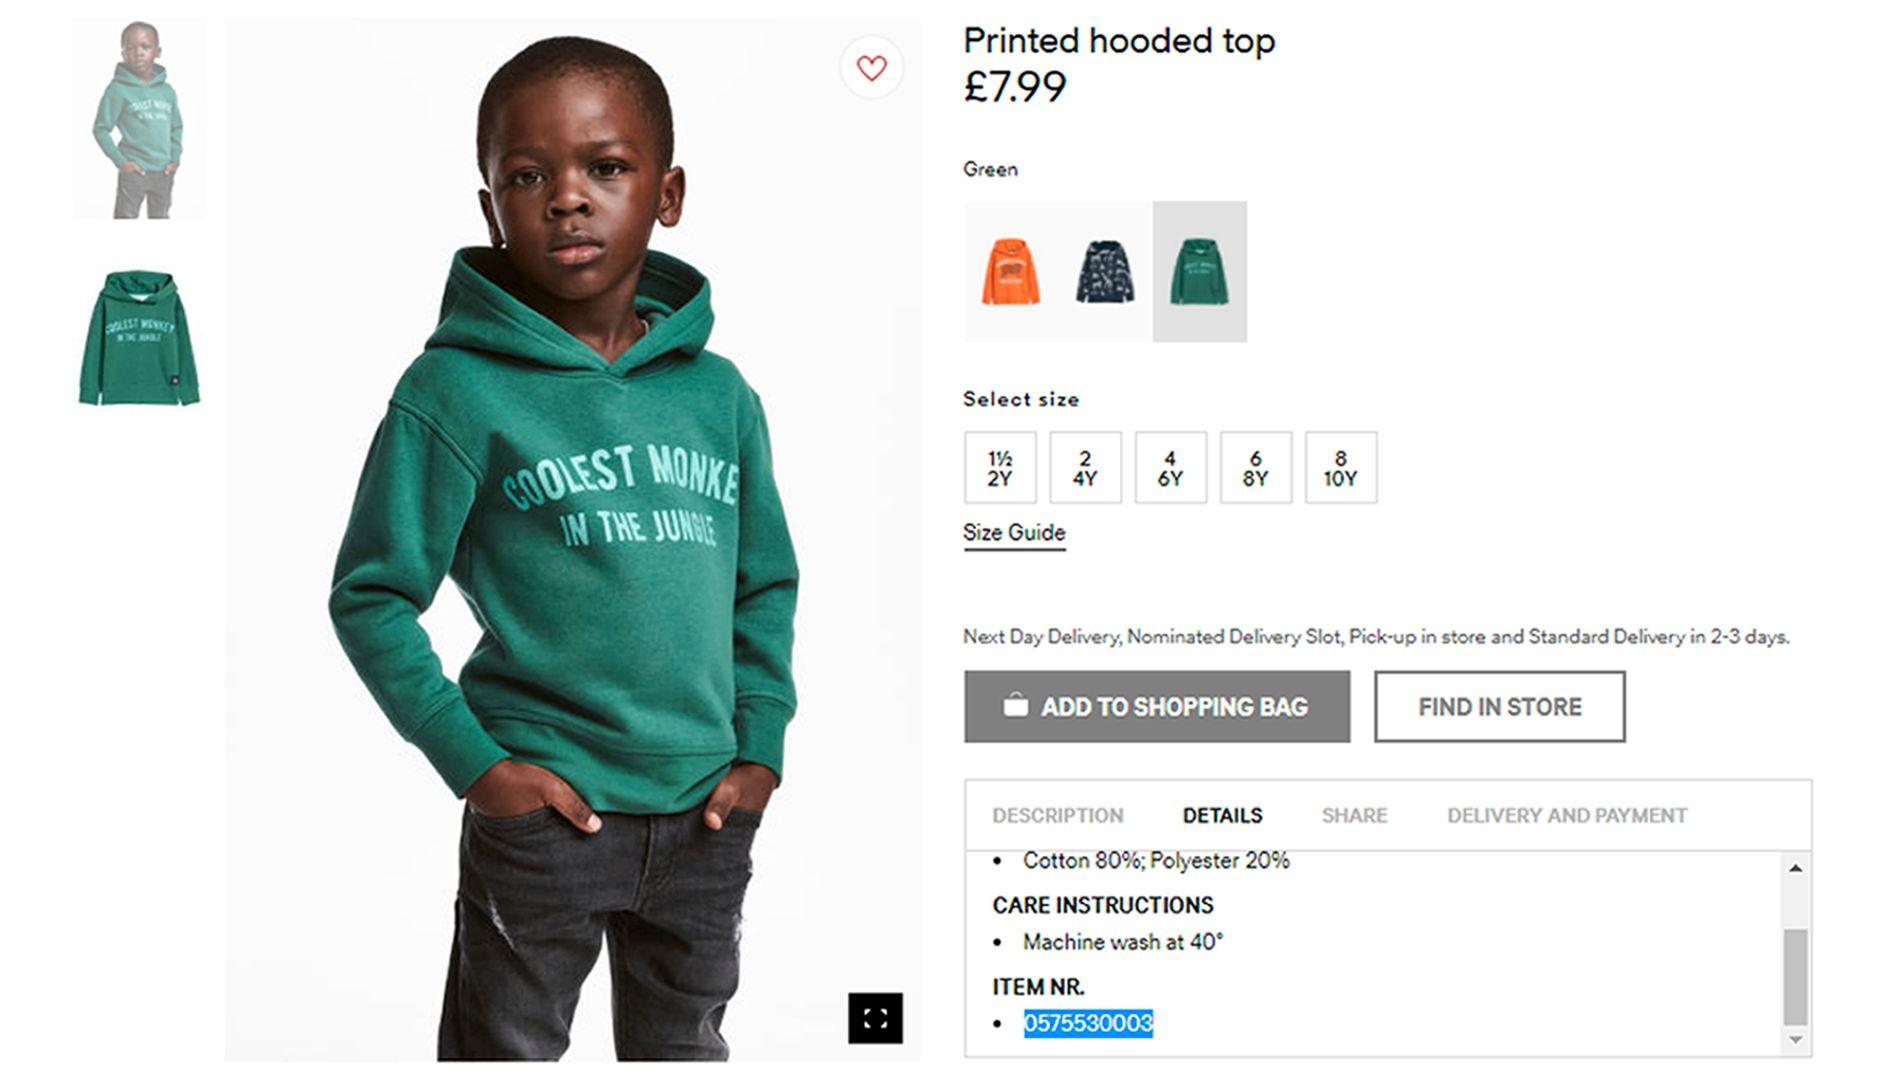 OMSTRIDT: Denne H&M-annonsen har ført til anklager om skjult rasisme og utløst protester verden over.